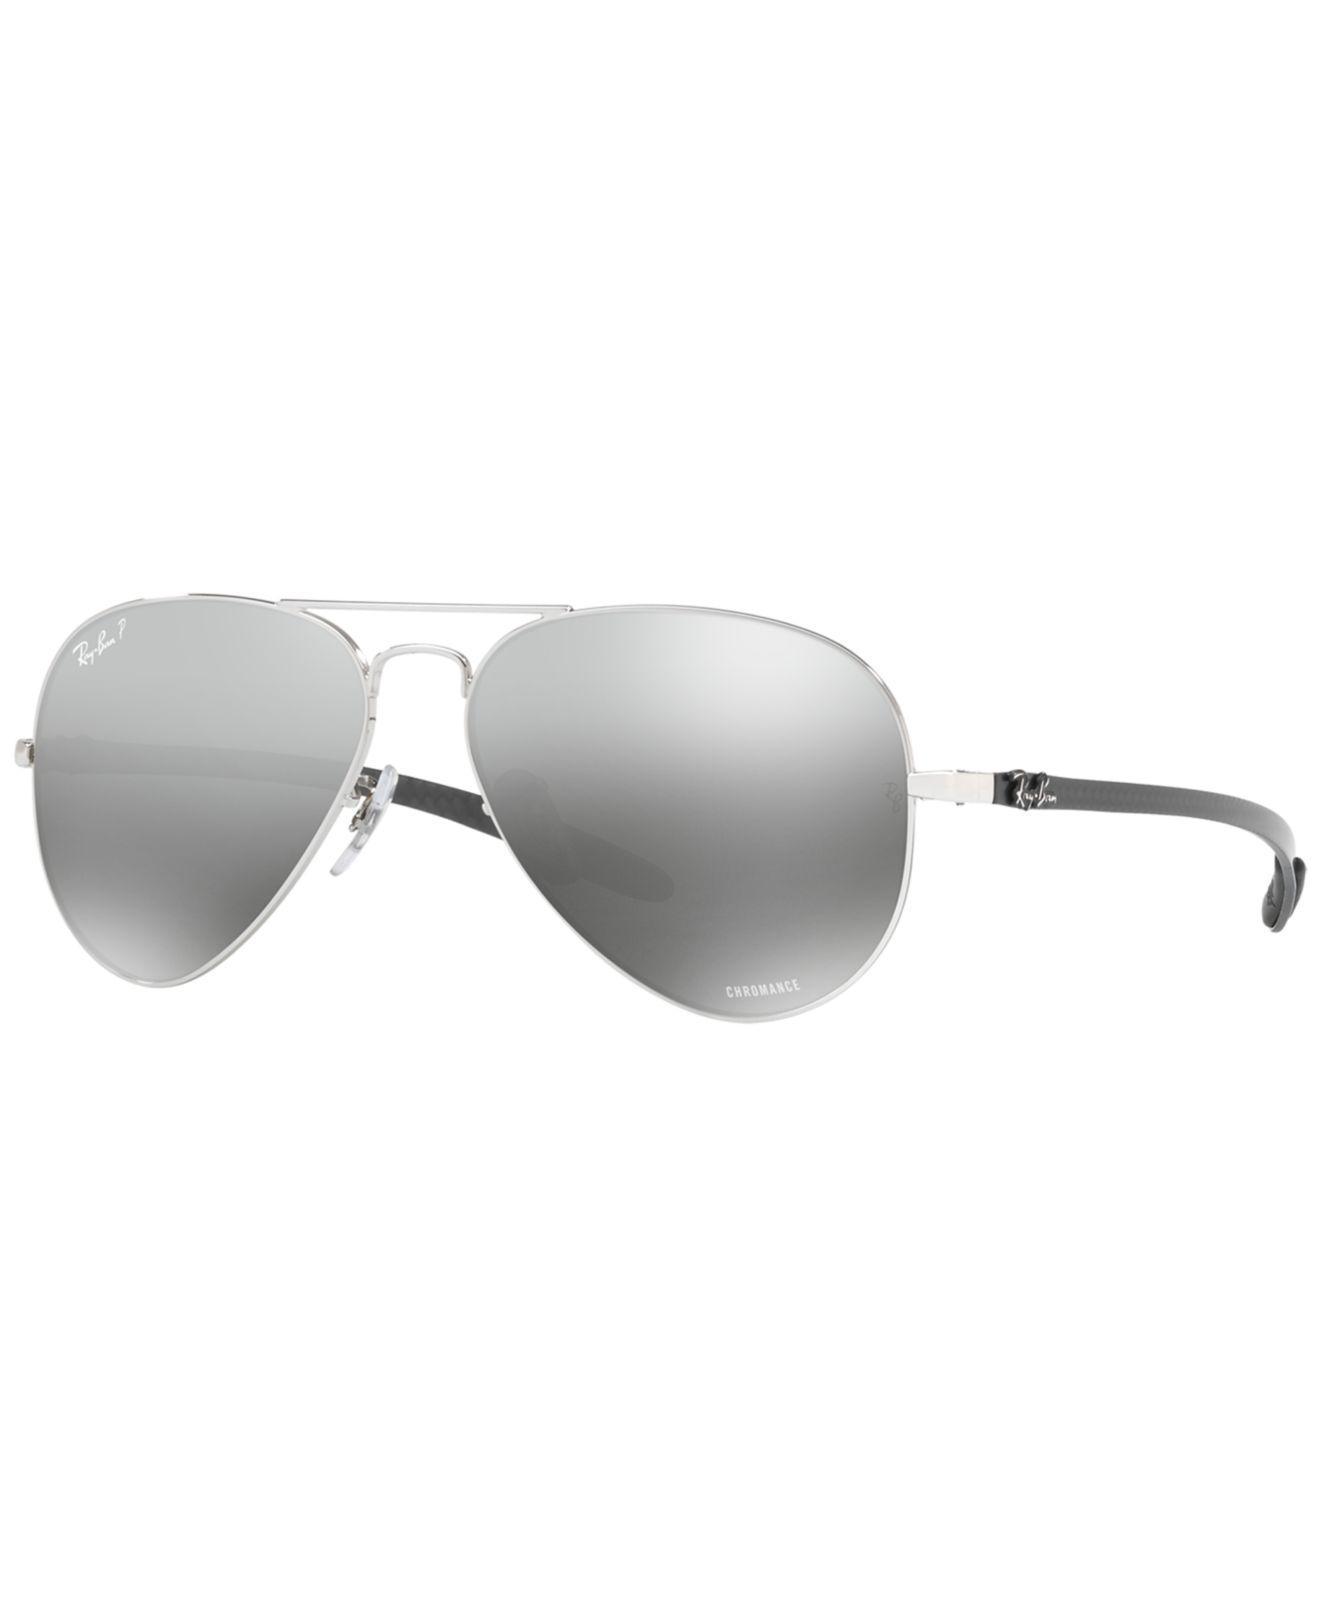 7a10415fd4d17 Ray-Ban. Men s Gray Polarized Sunglasses